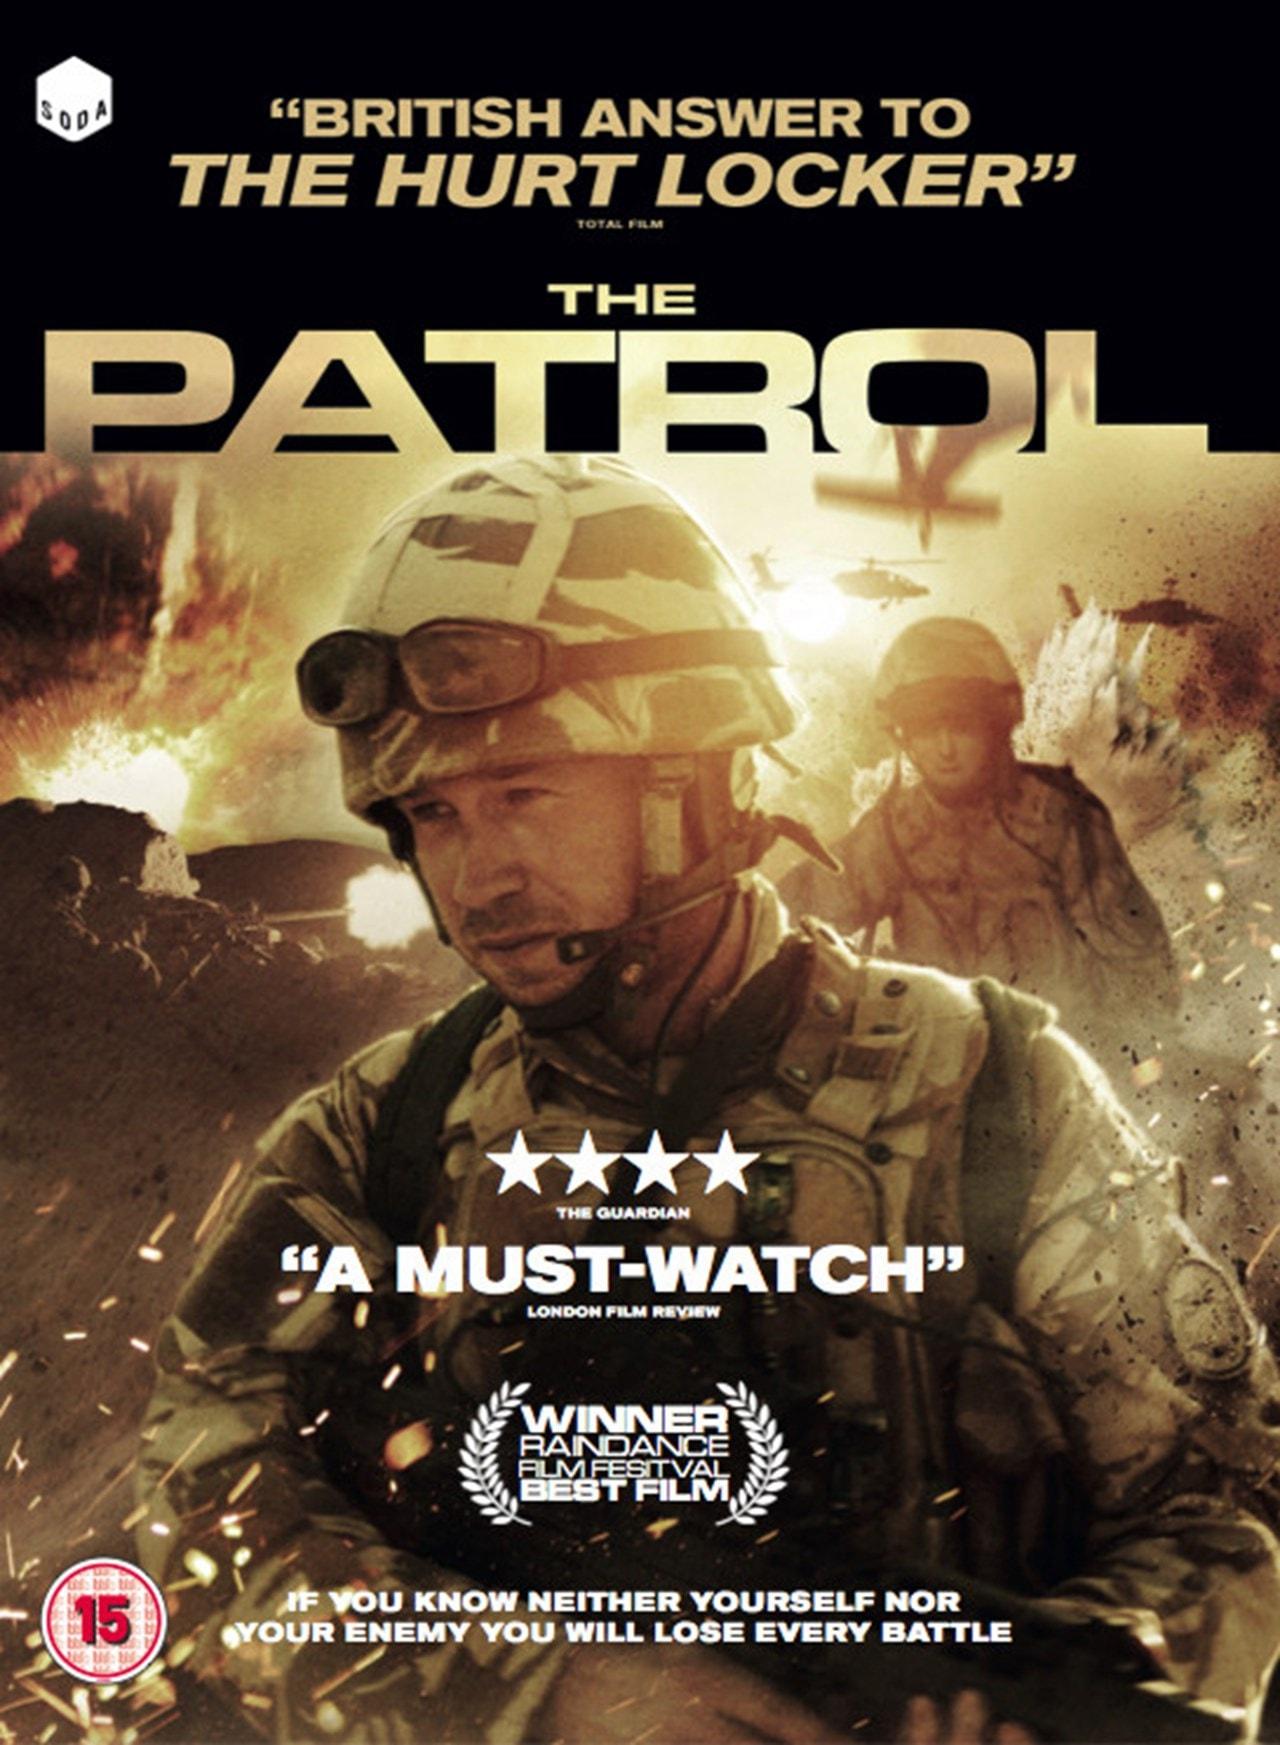 The Patrol - 1